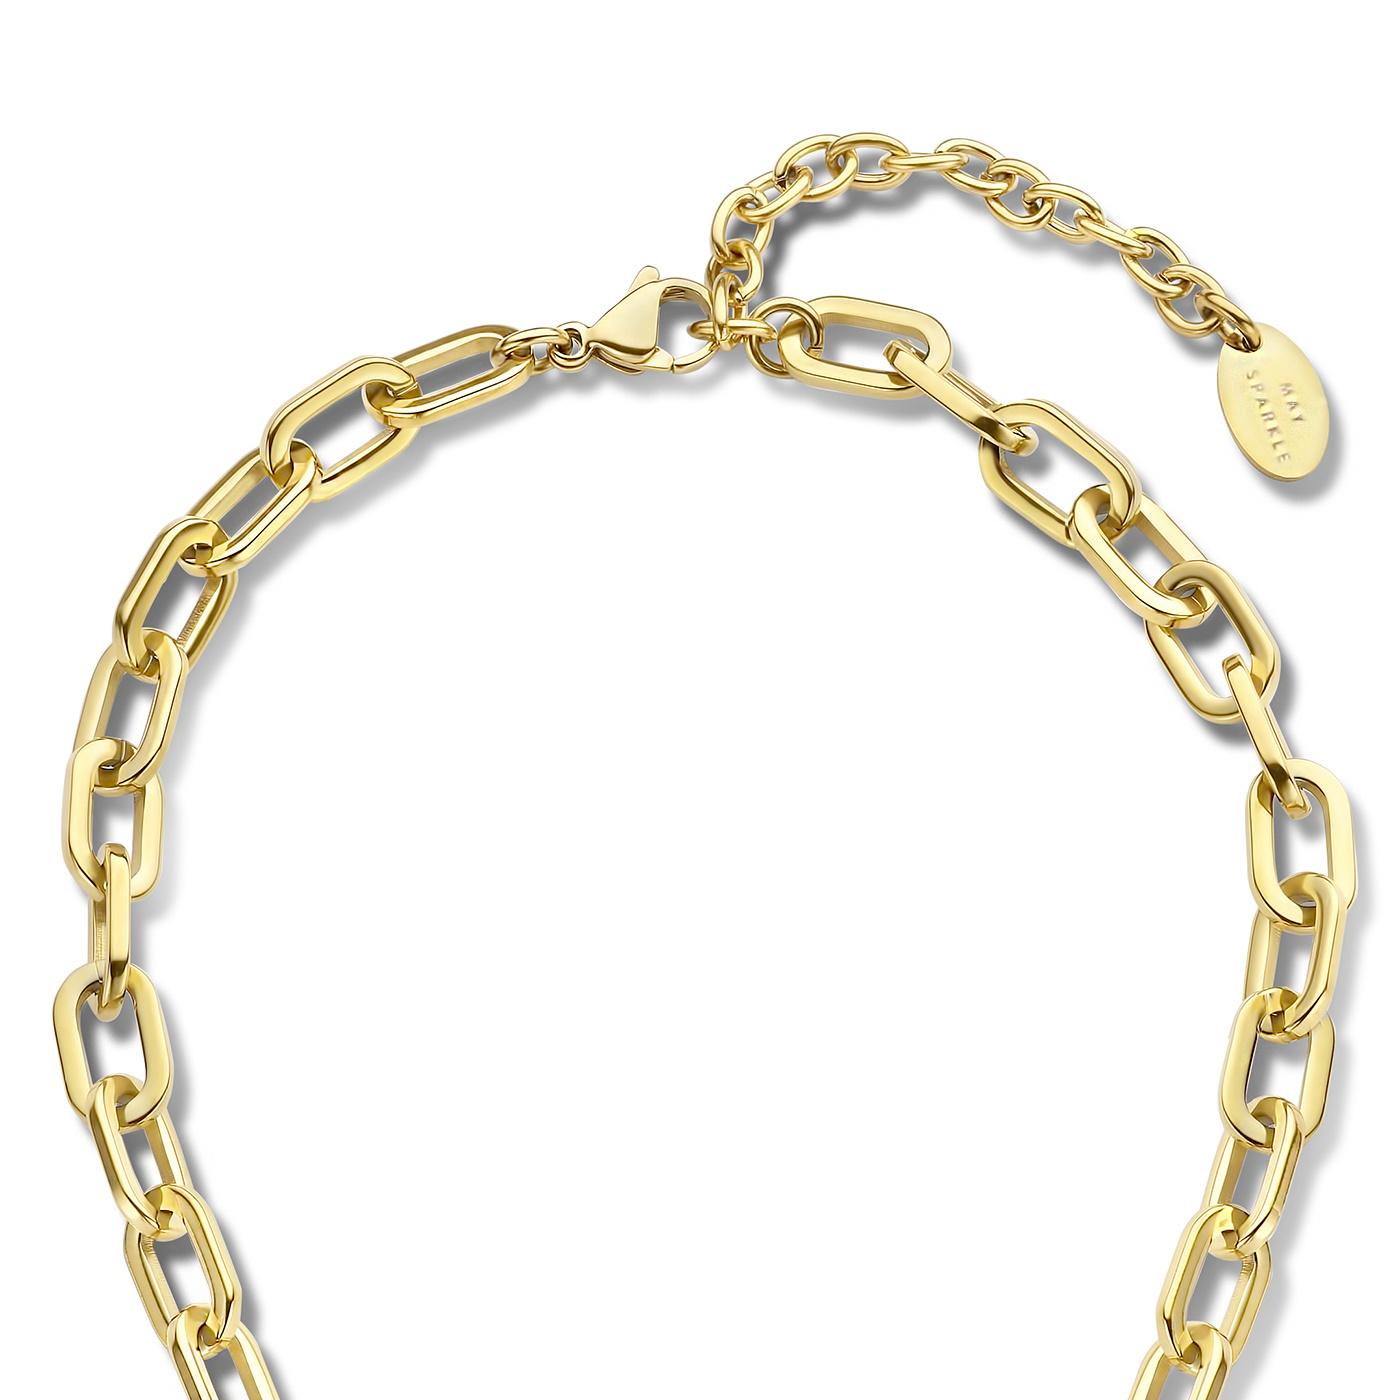 May Sparkle Beach Girl Amber goudkleurige ketting